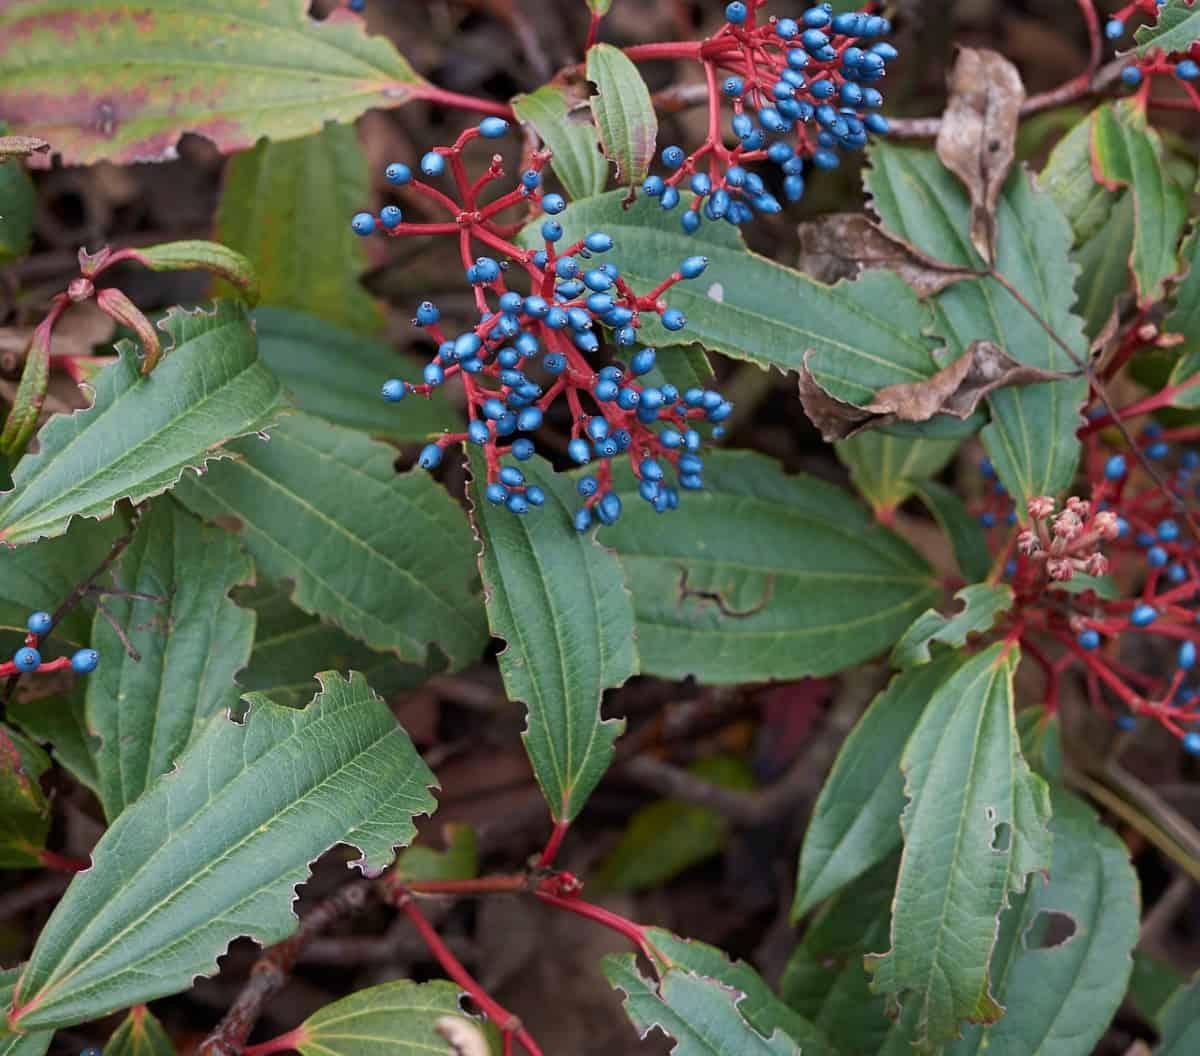 David viburnum has blue-green winter foliage.